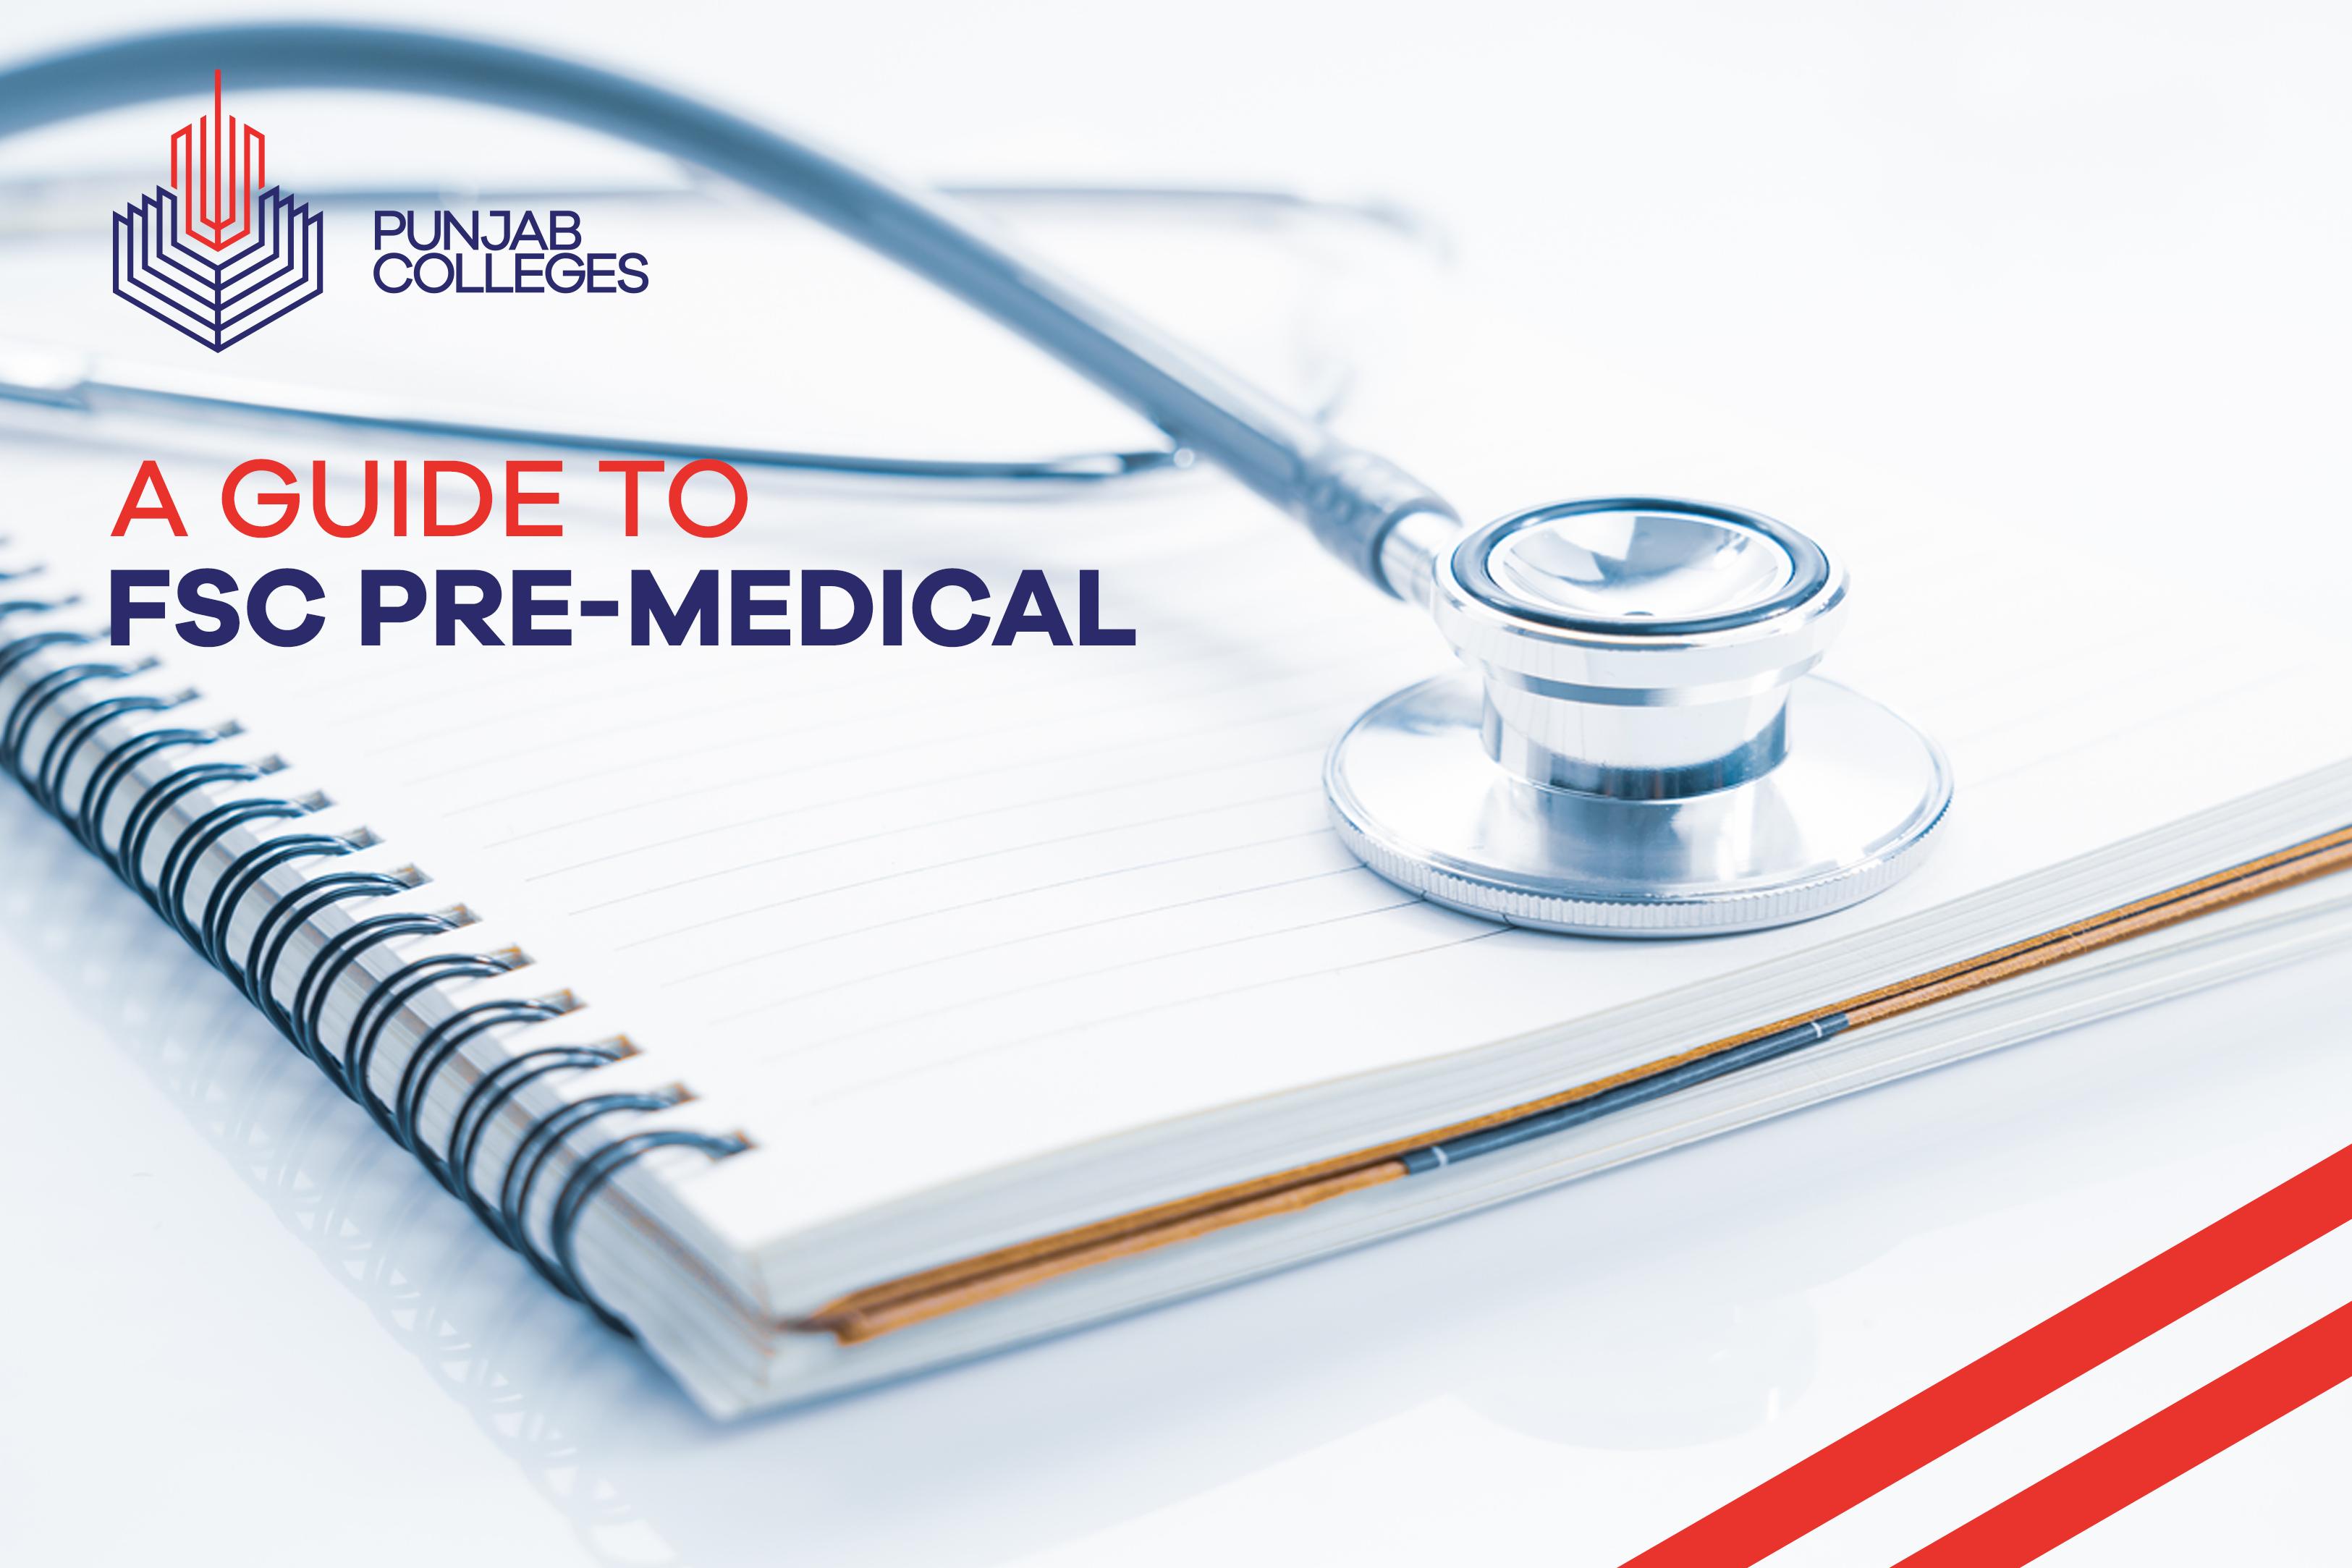 A Guide to FSc Pre-Medical